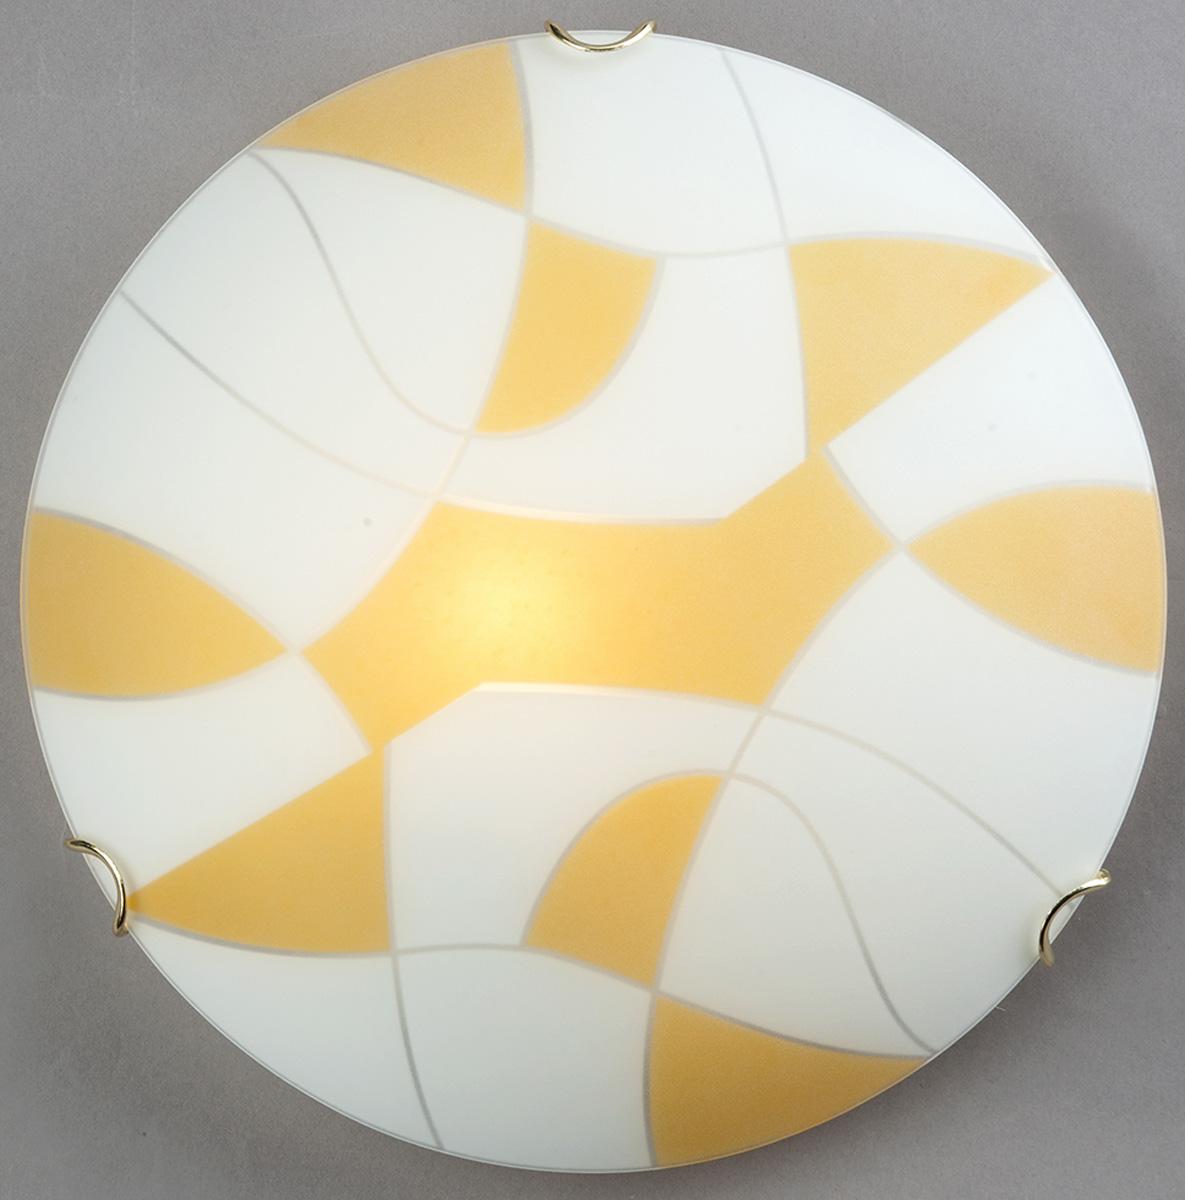 Светильник настенный Vitaluce, 1 х E27, 100W. V6413/1AV6413/1A